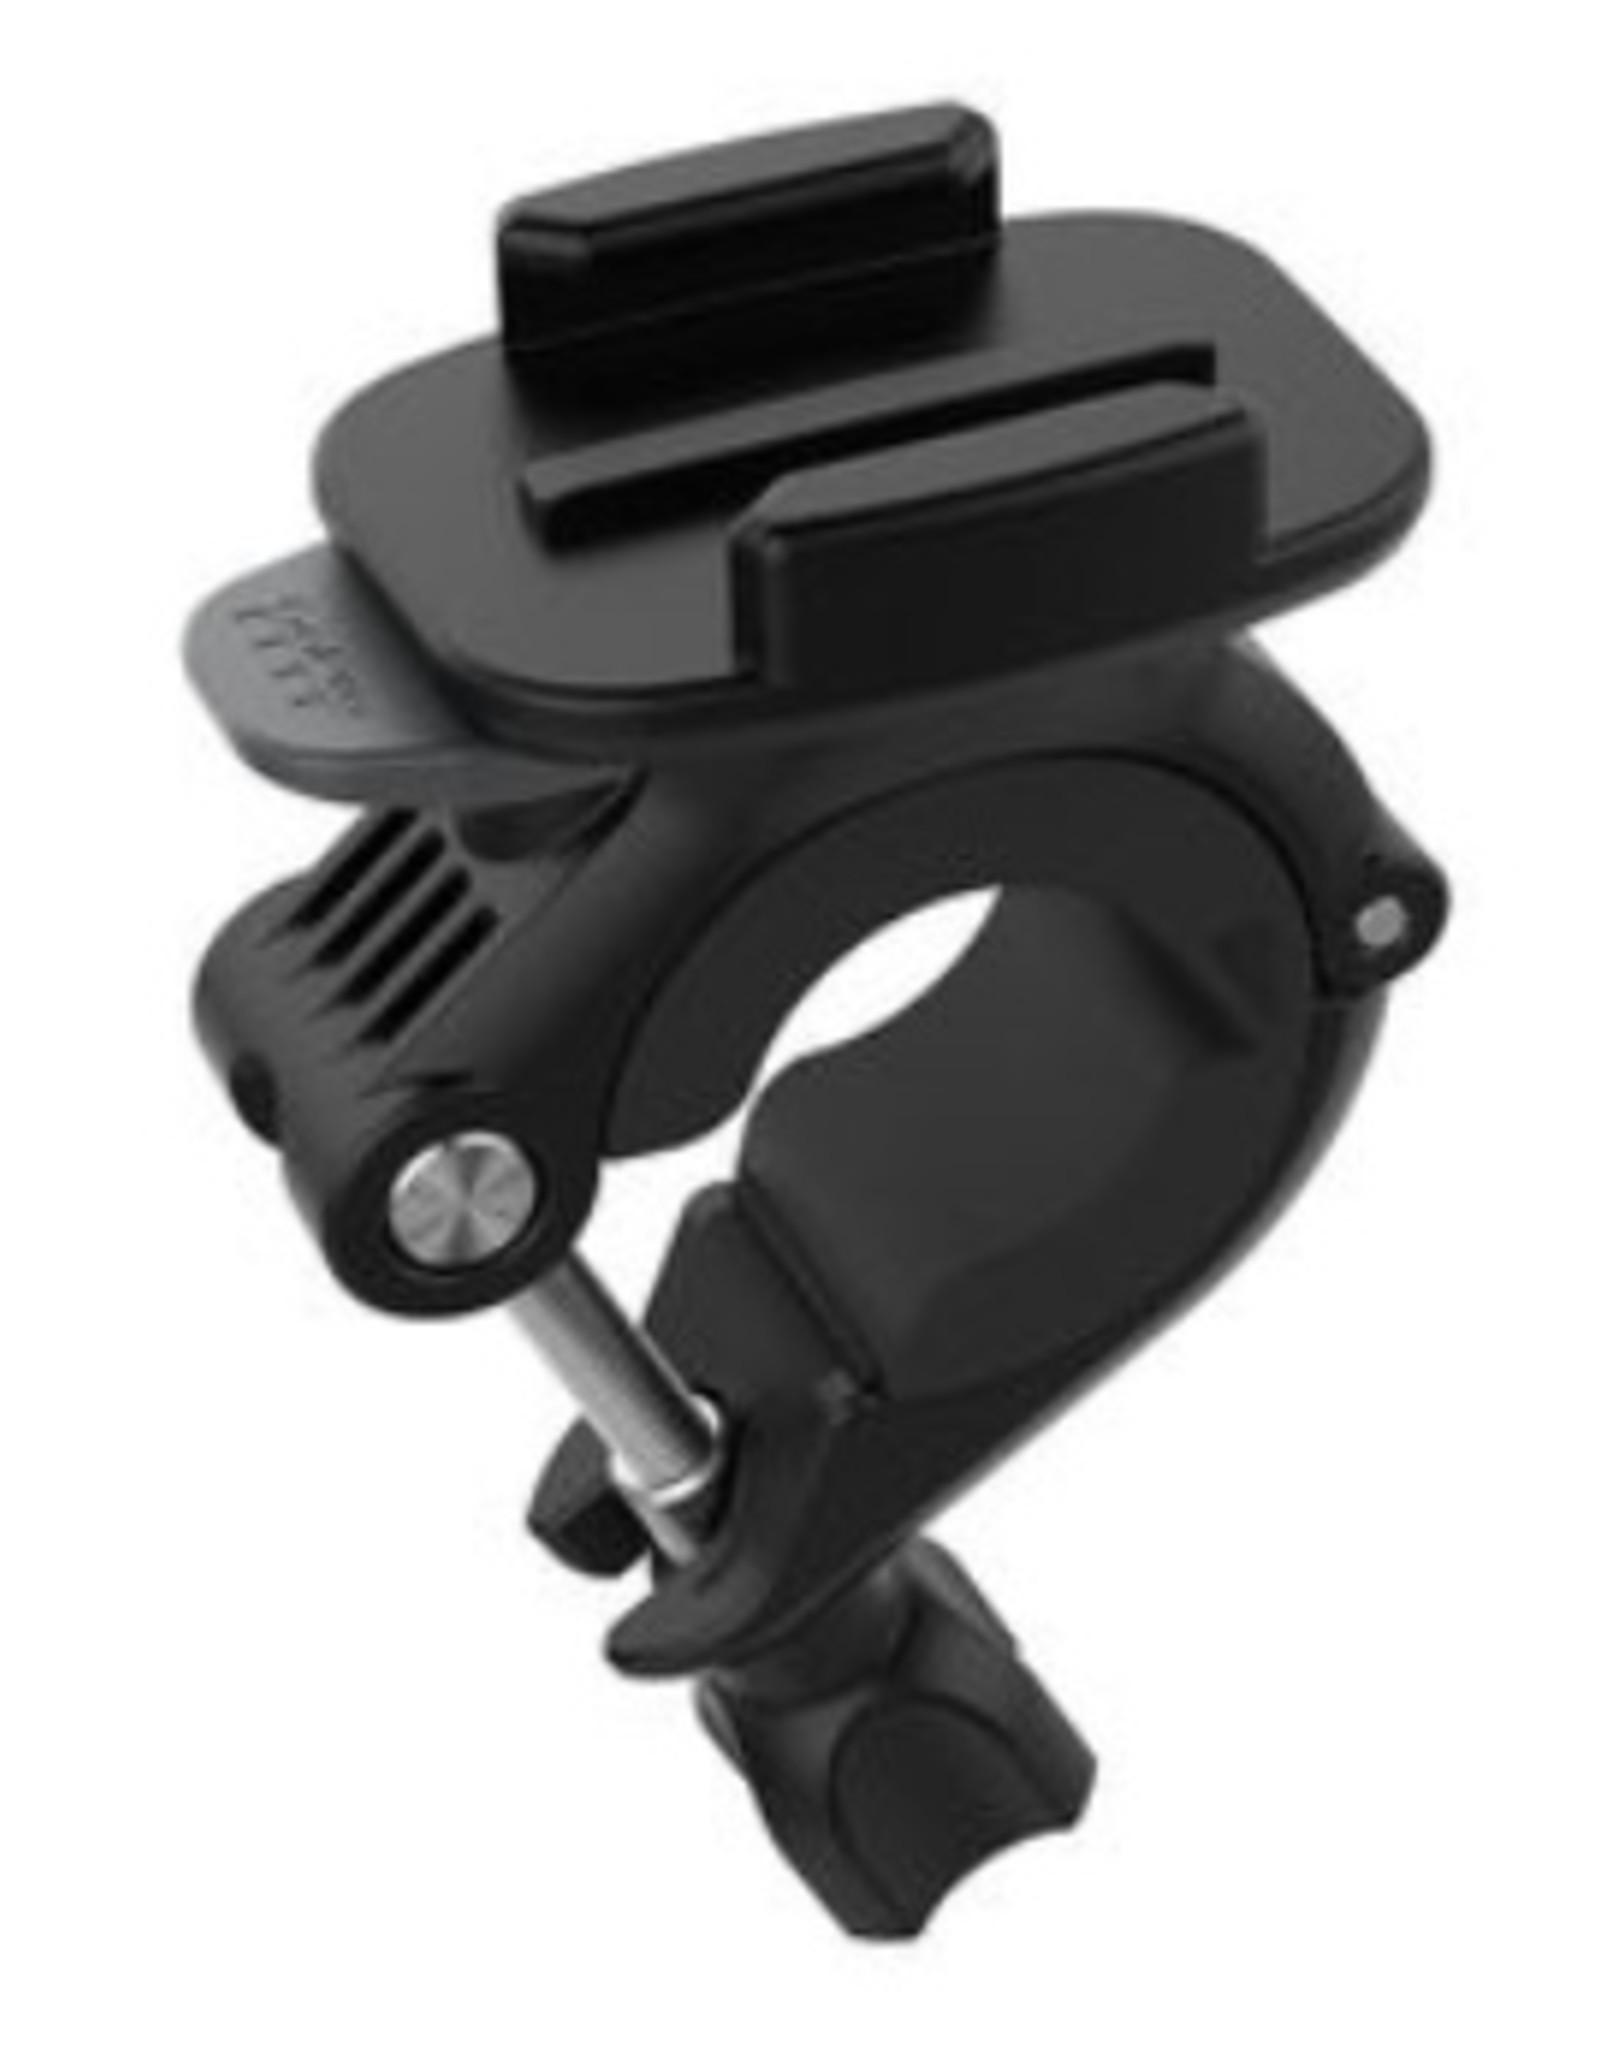 GoPro GoPro | Handlebar, Seatpost and Pole Mount | GP-AGTSM-001